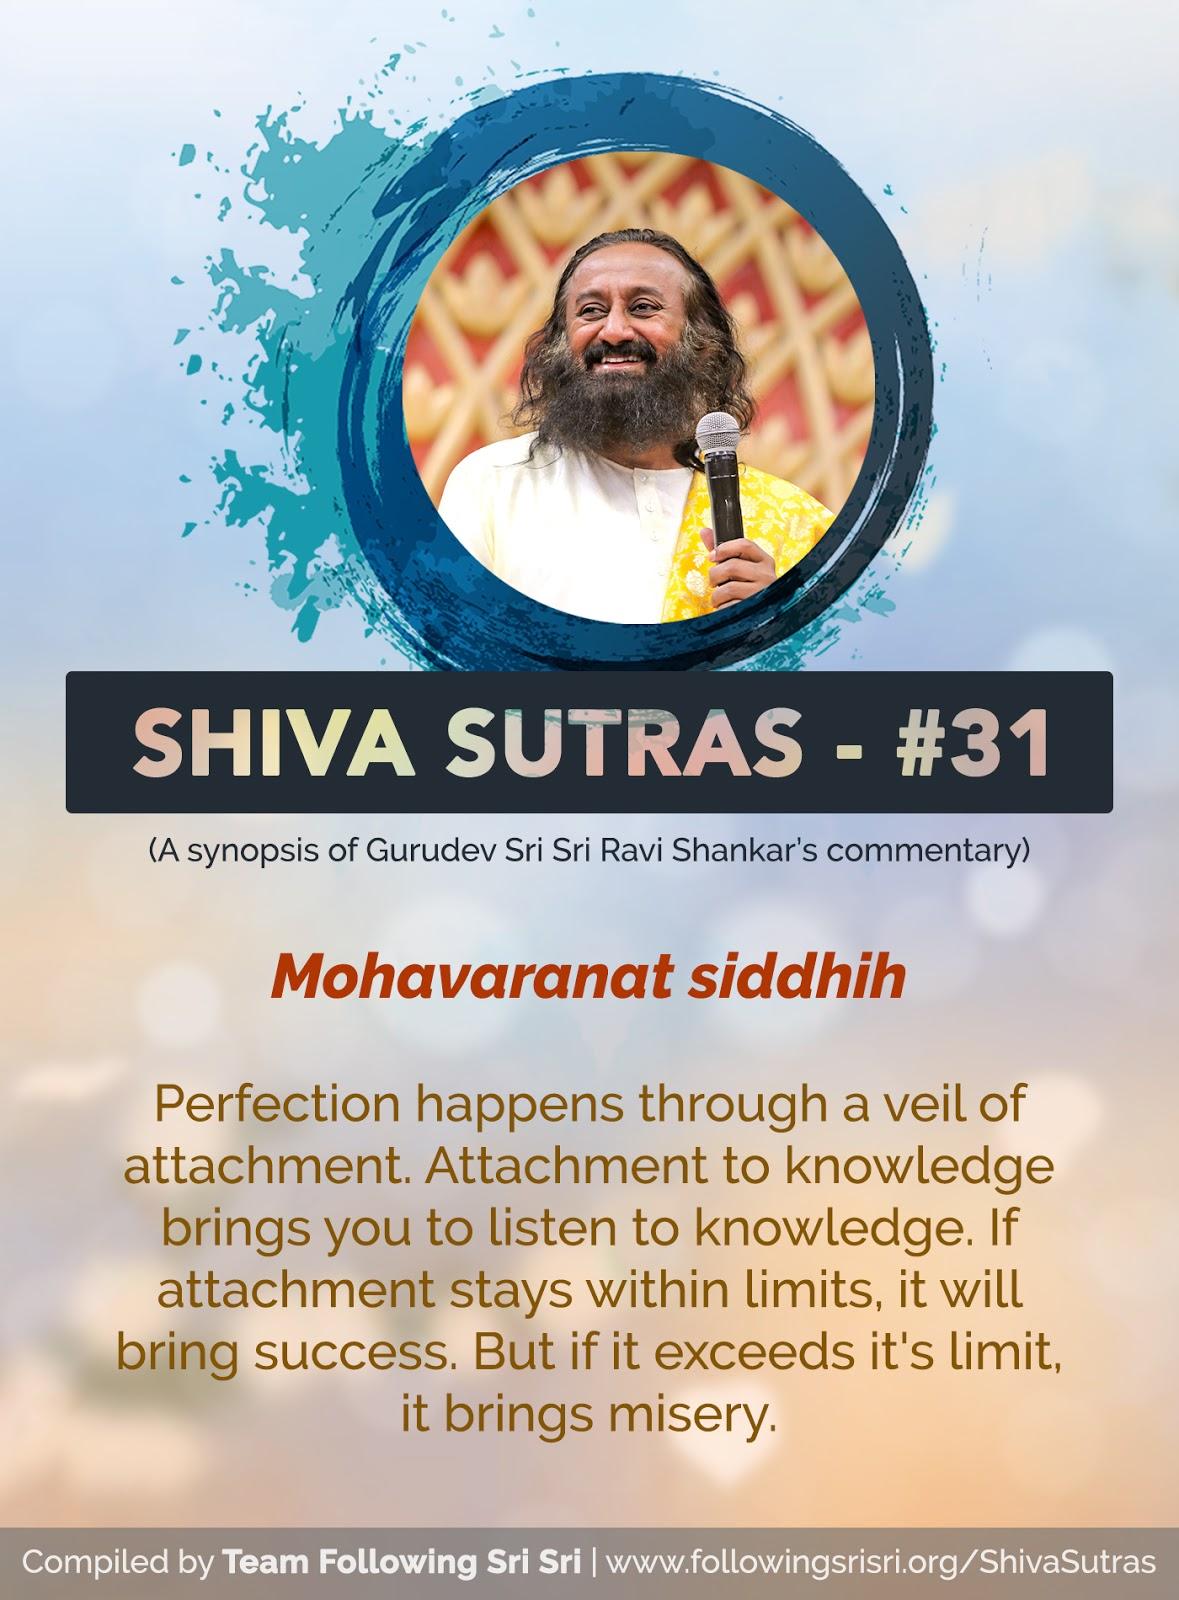 Shiva Sutras - Sutra 31